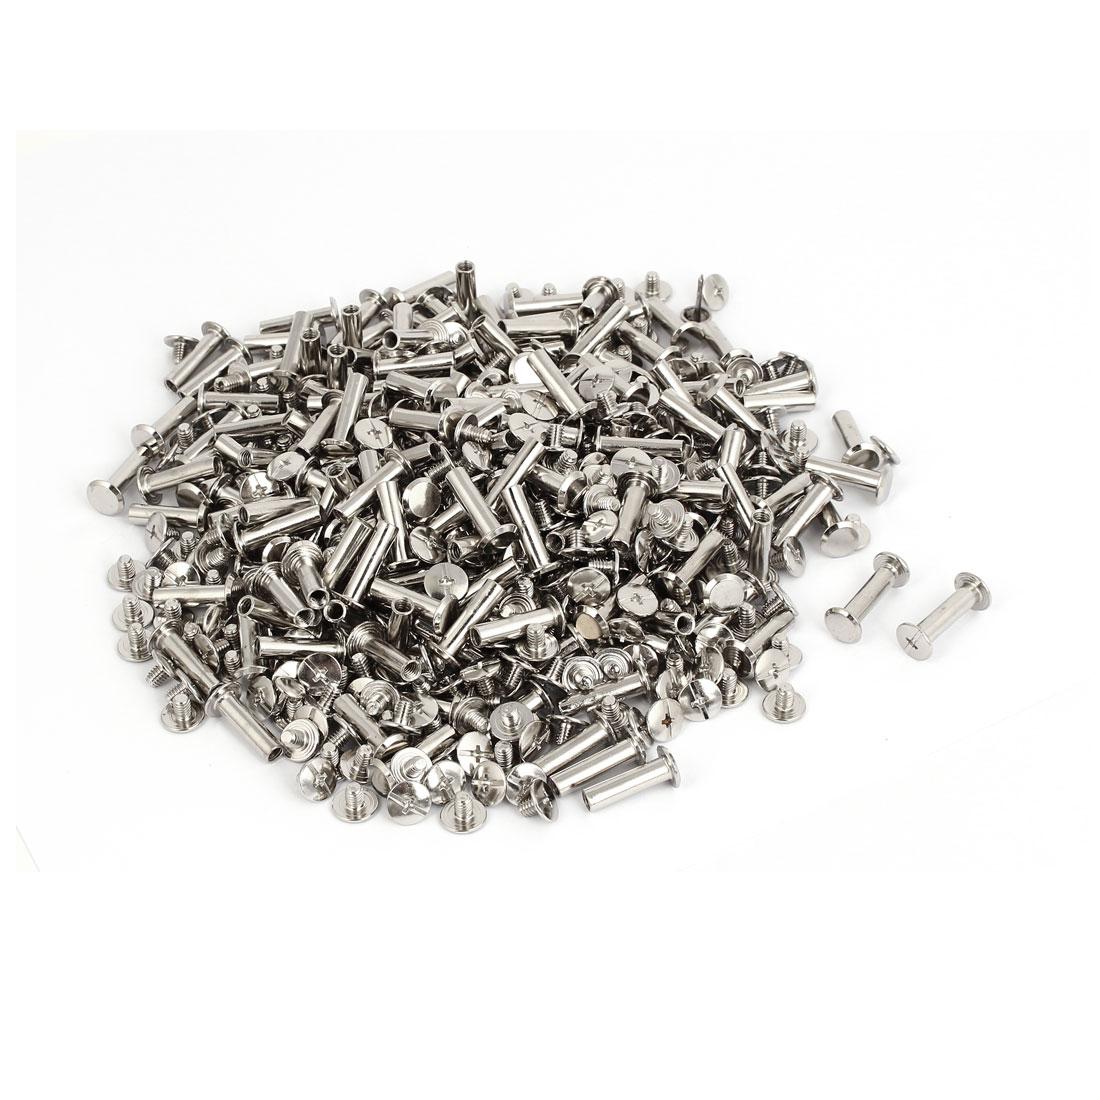 M5x18mm Photo Albums Scrapbook Metal Binding Screw Post Silver Tone 500 Pcs